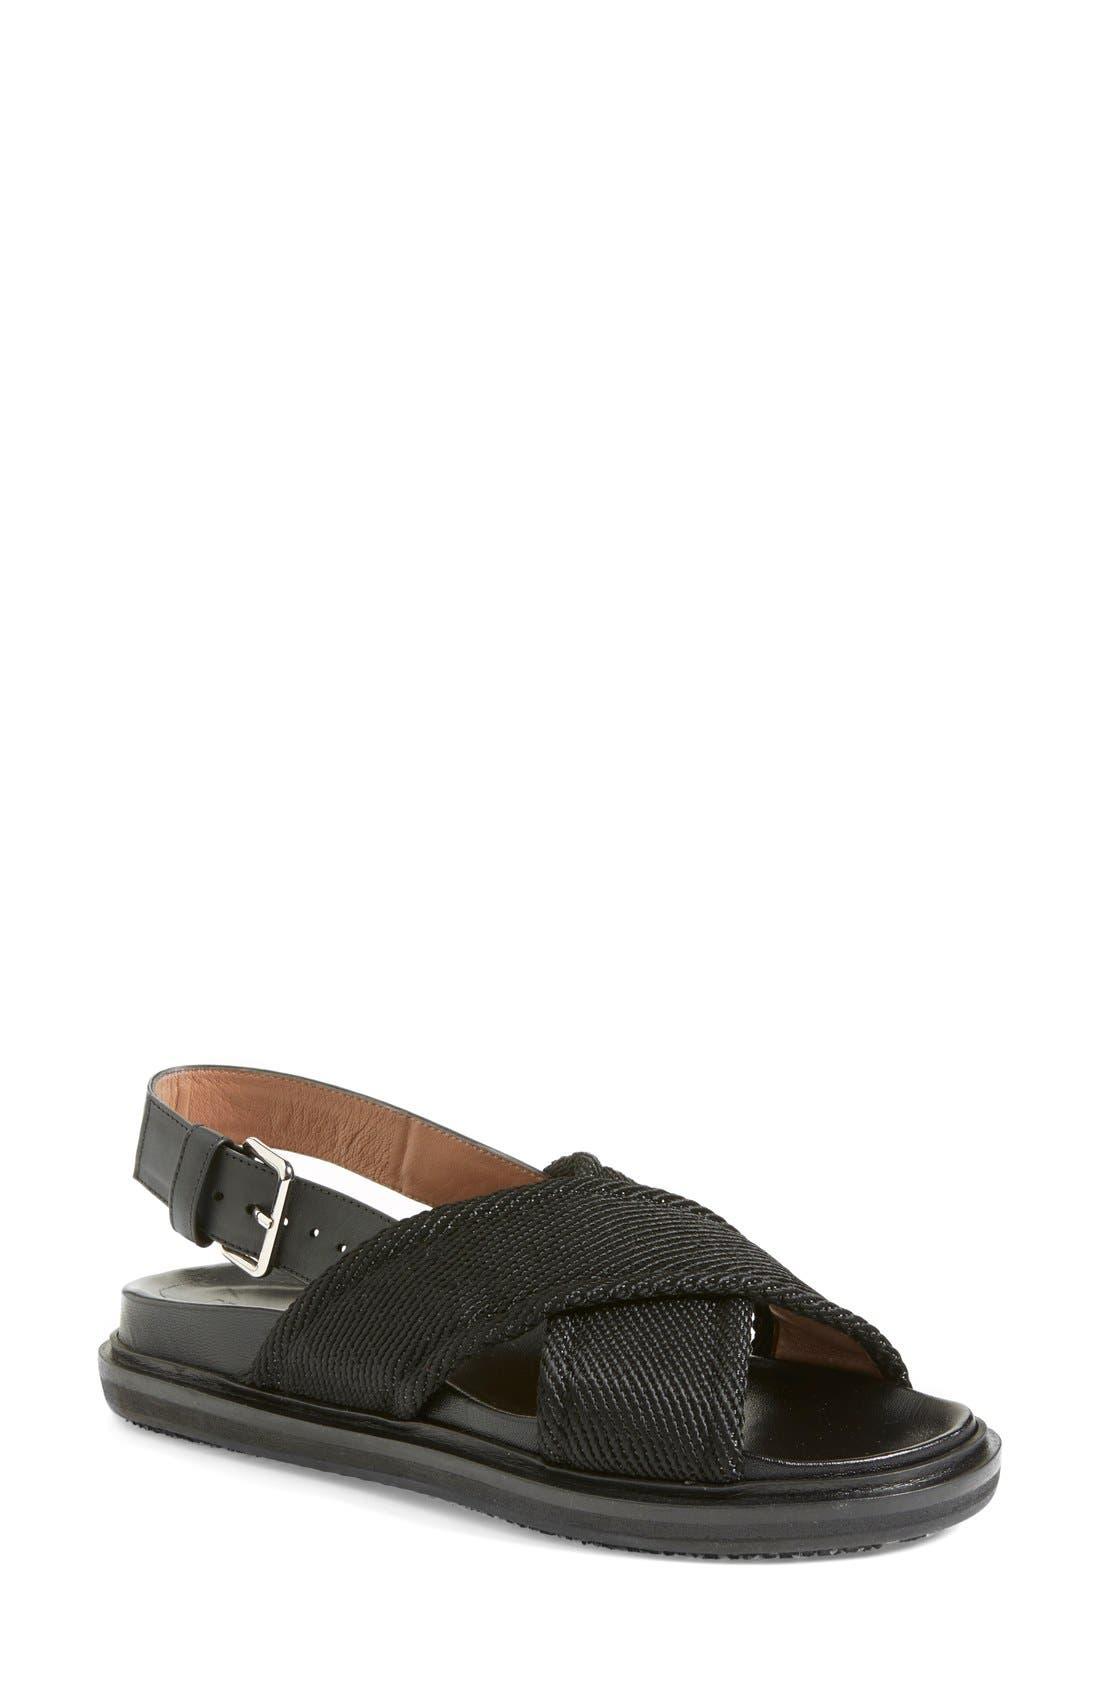 Main Image - Marni 'Fussbett' Sandal (Women)